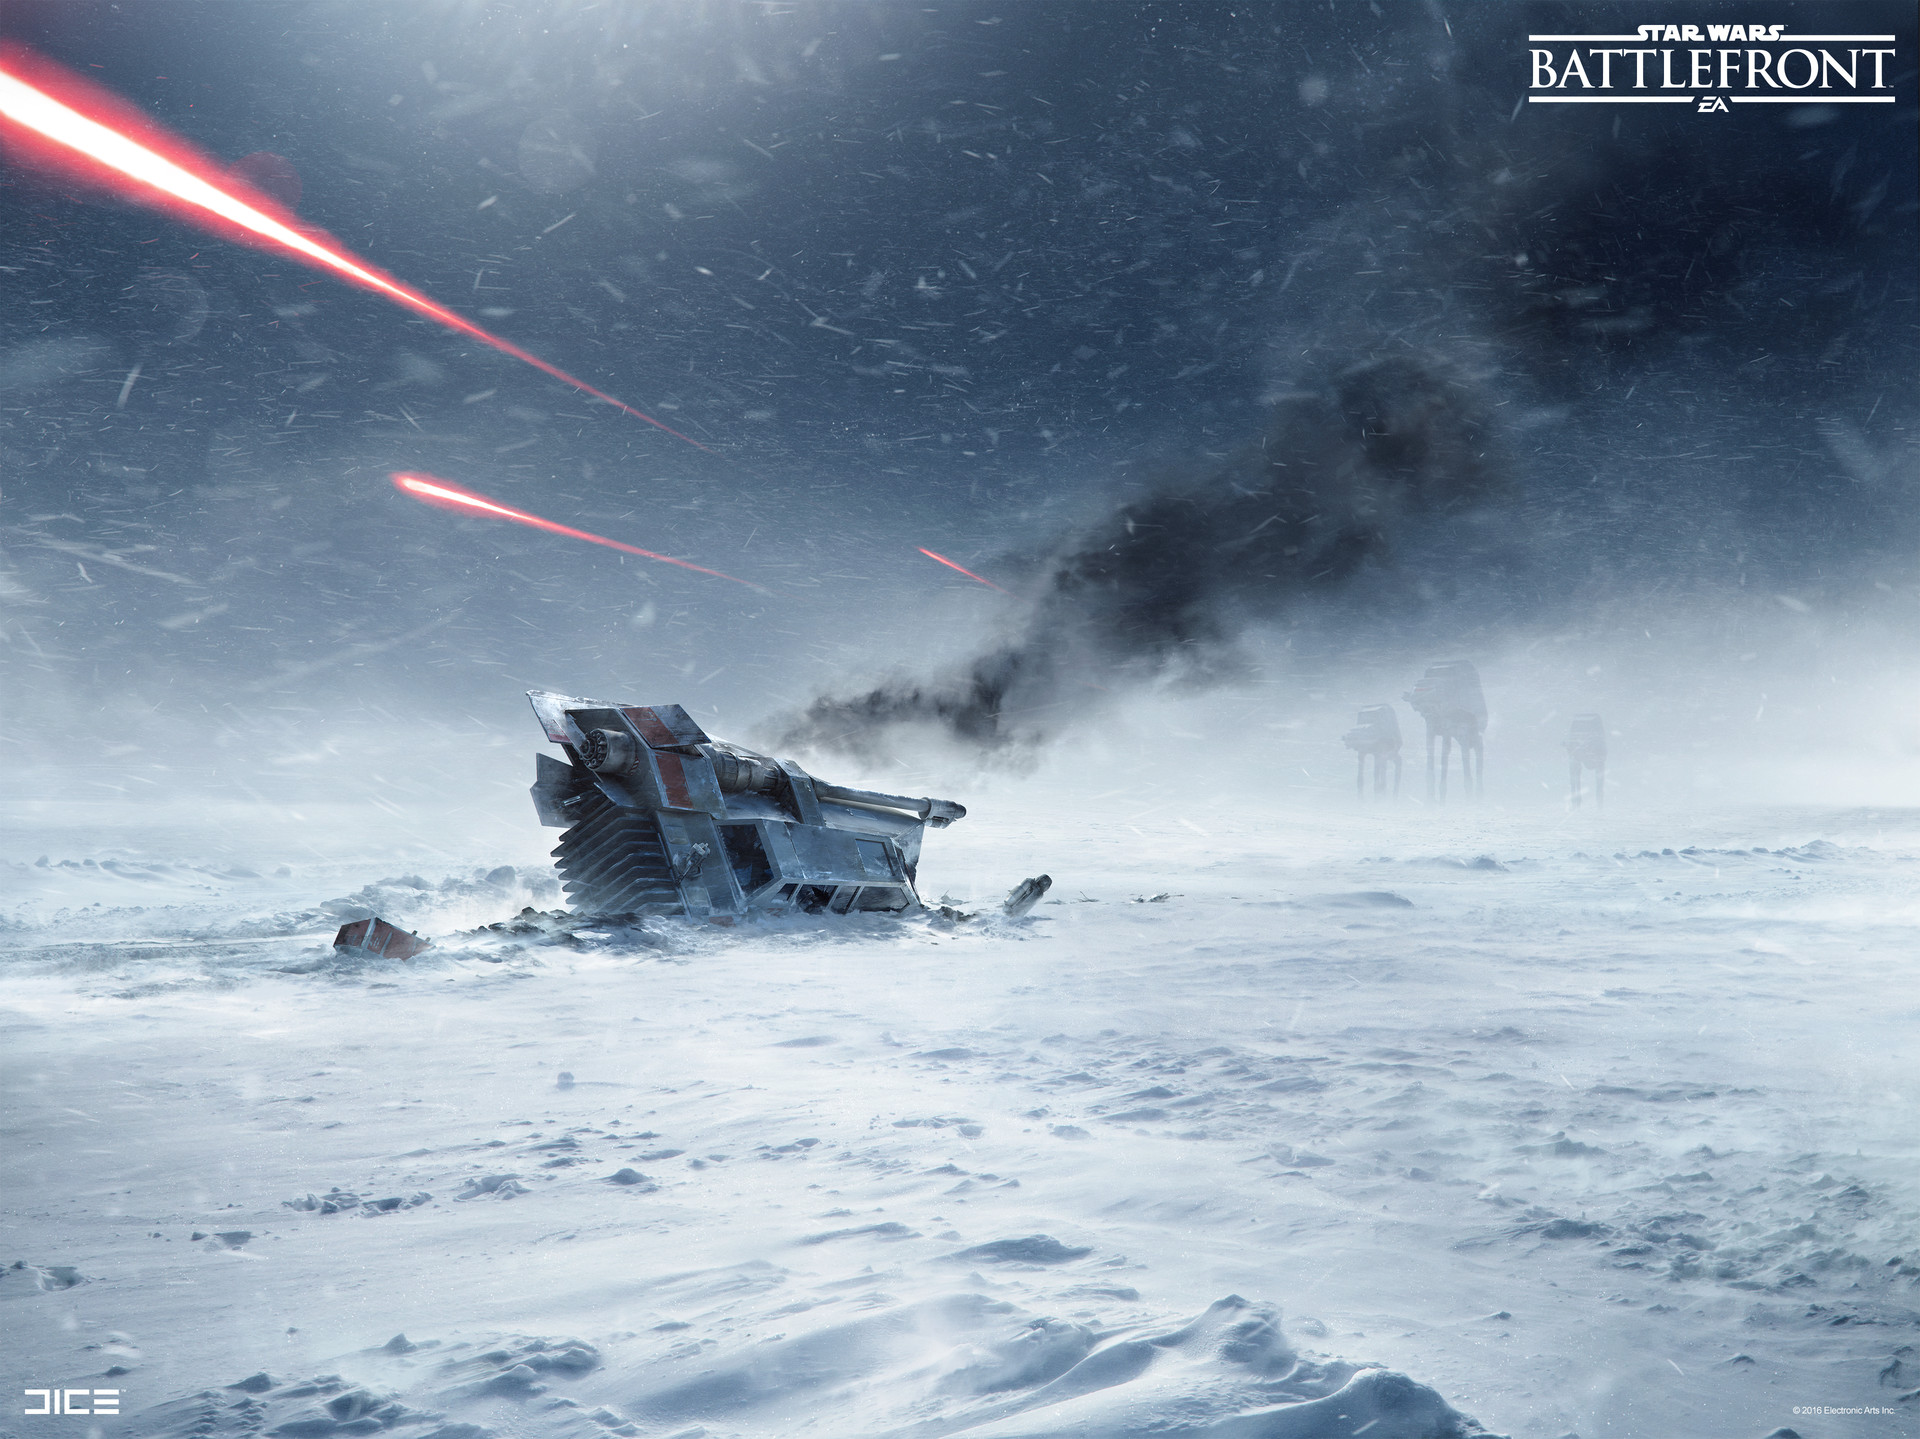 Star Wars Battlefront Concept Art by Anton Grandert